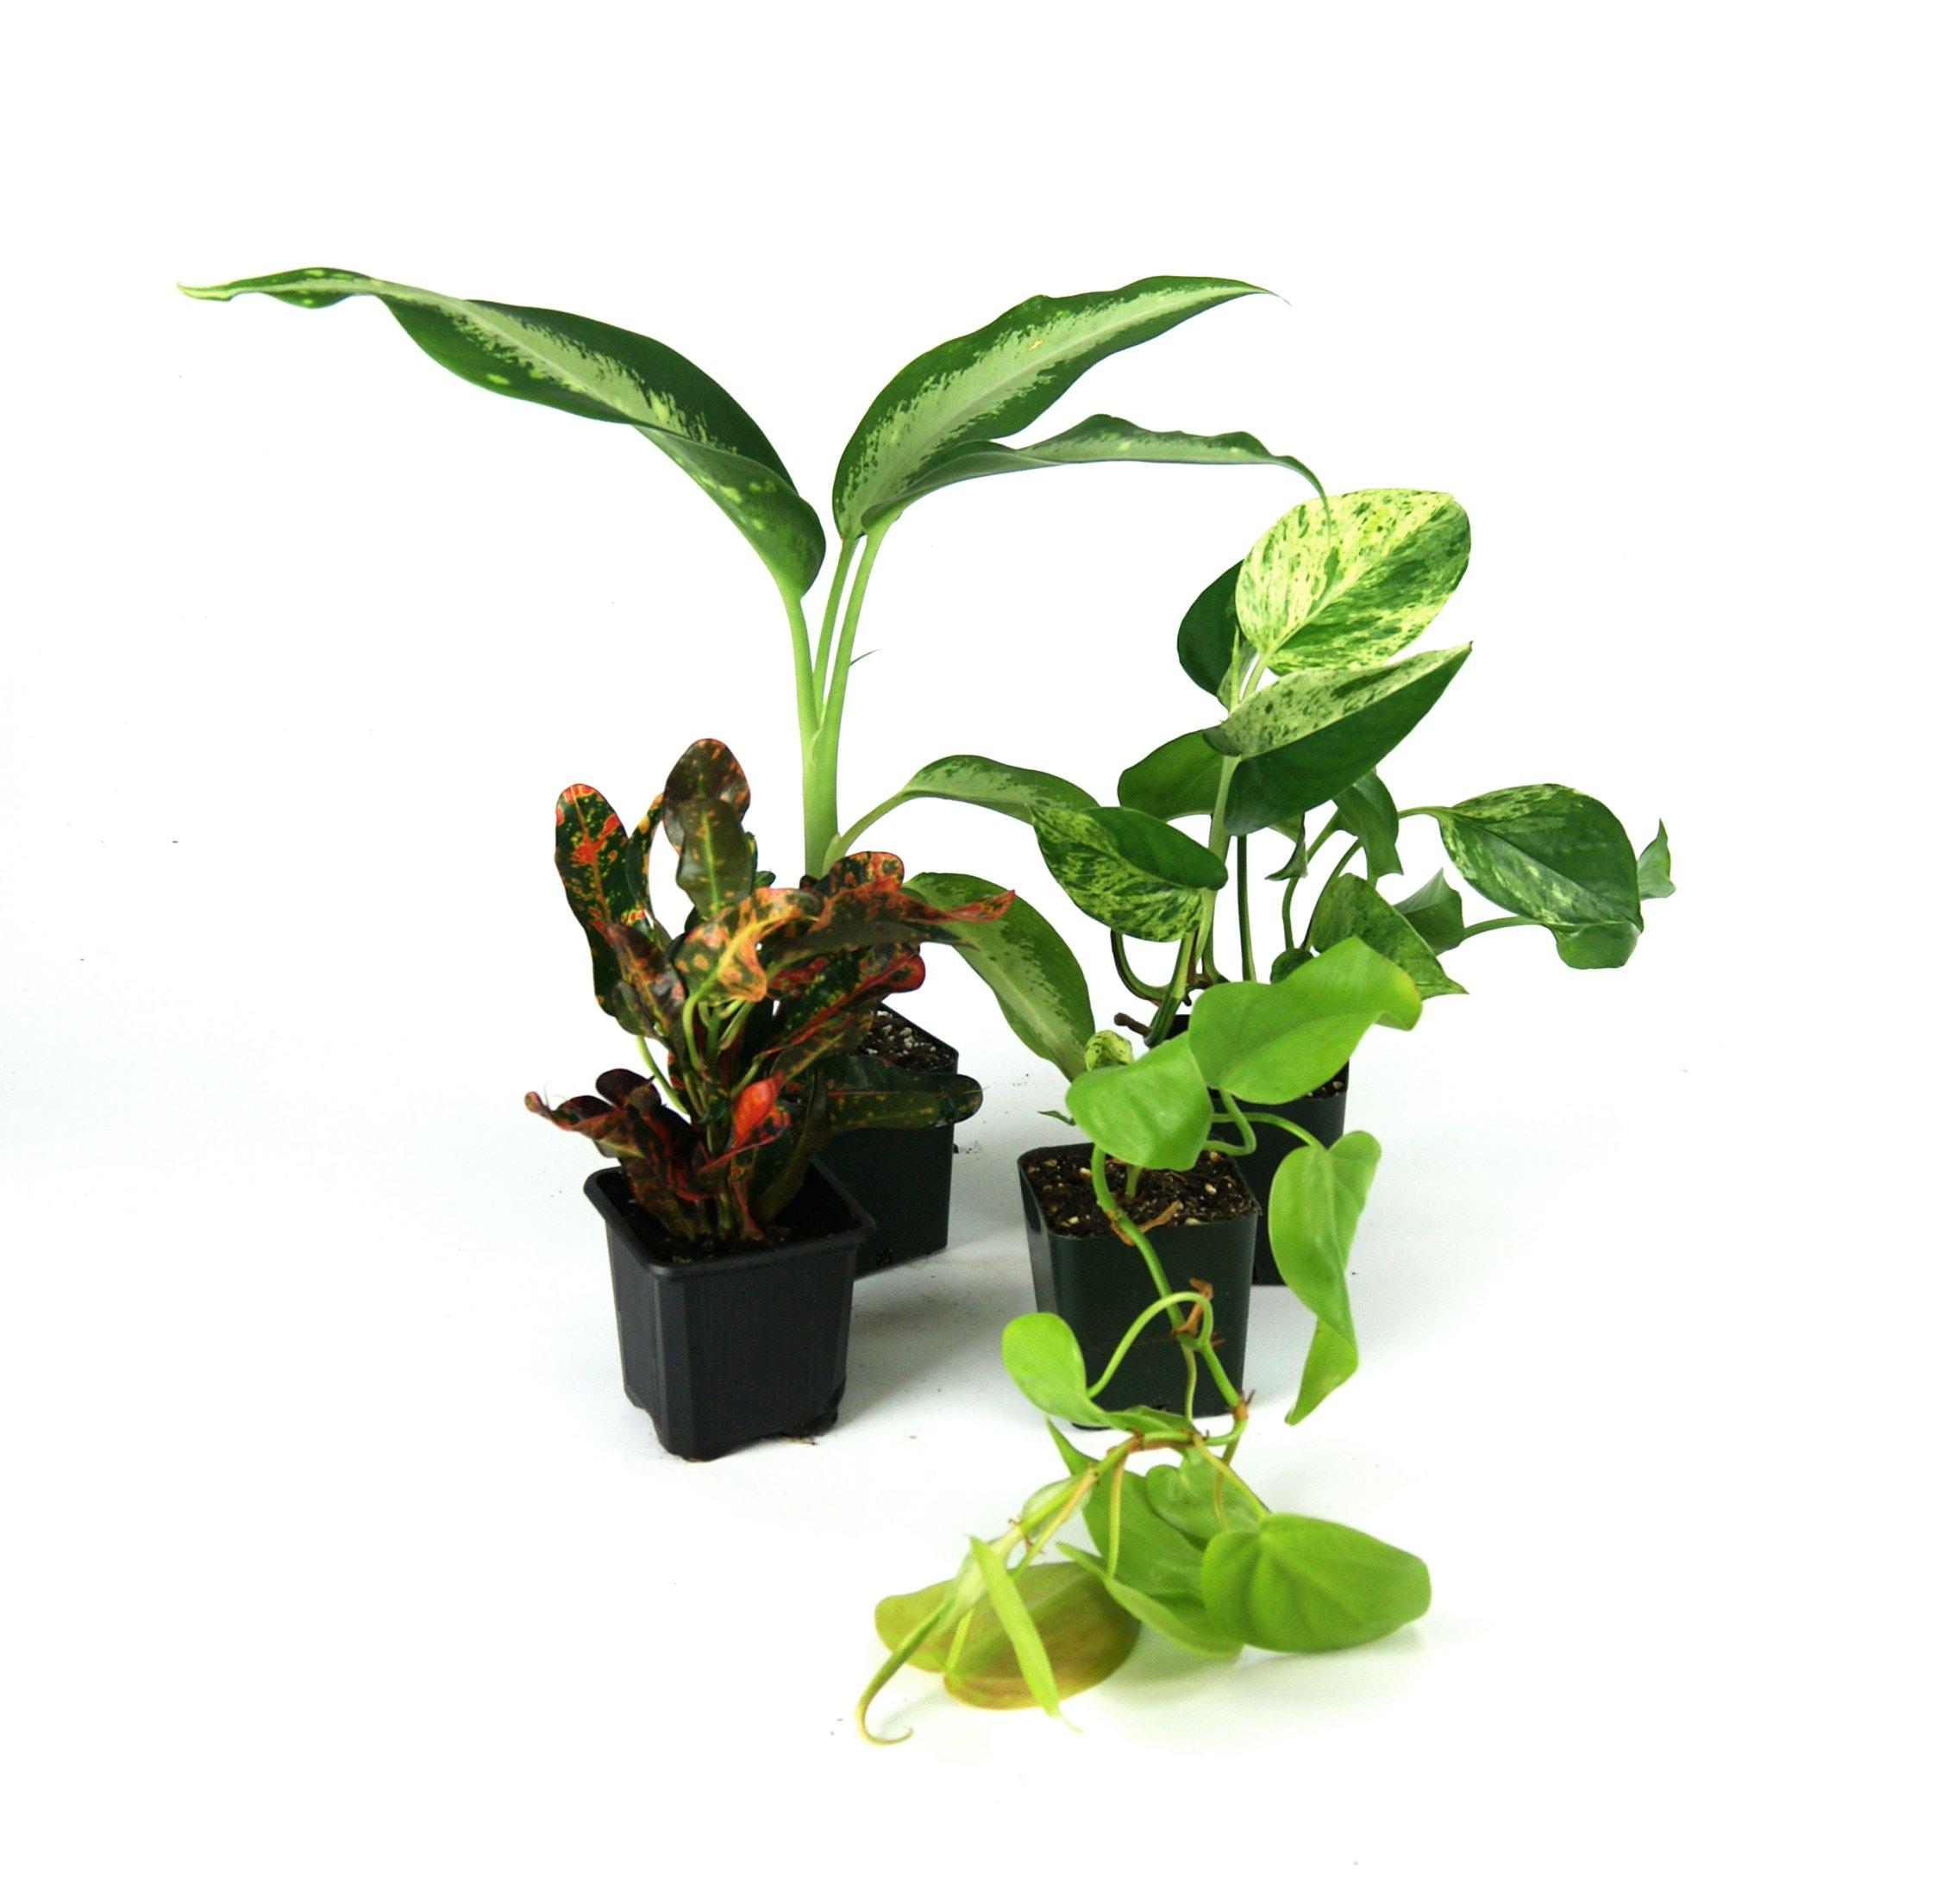 Large Crested Gecko Vivarium Plant Kit by Josh's Frogs